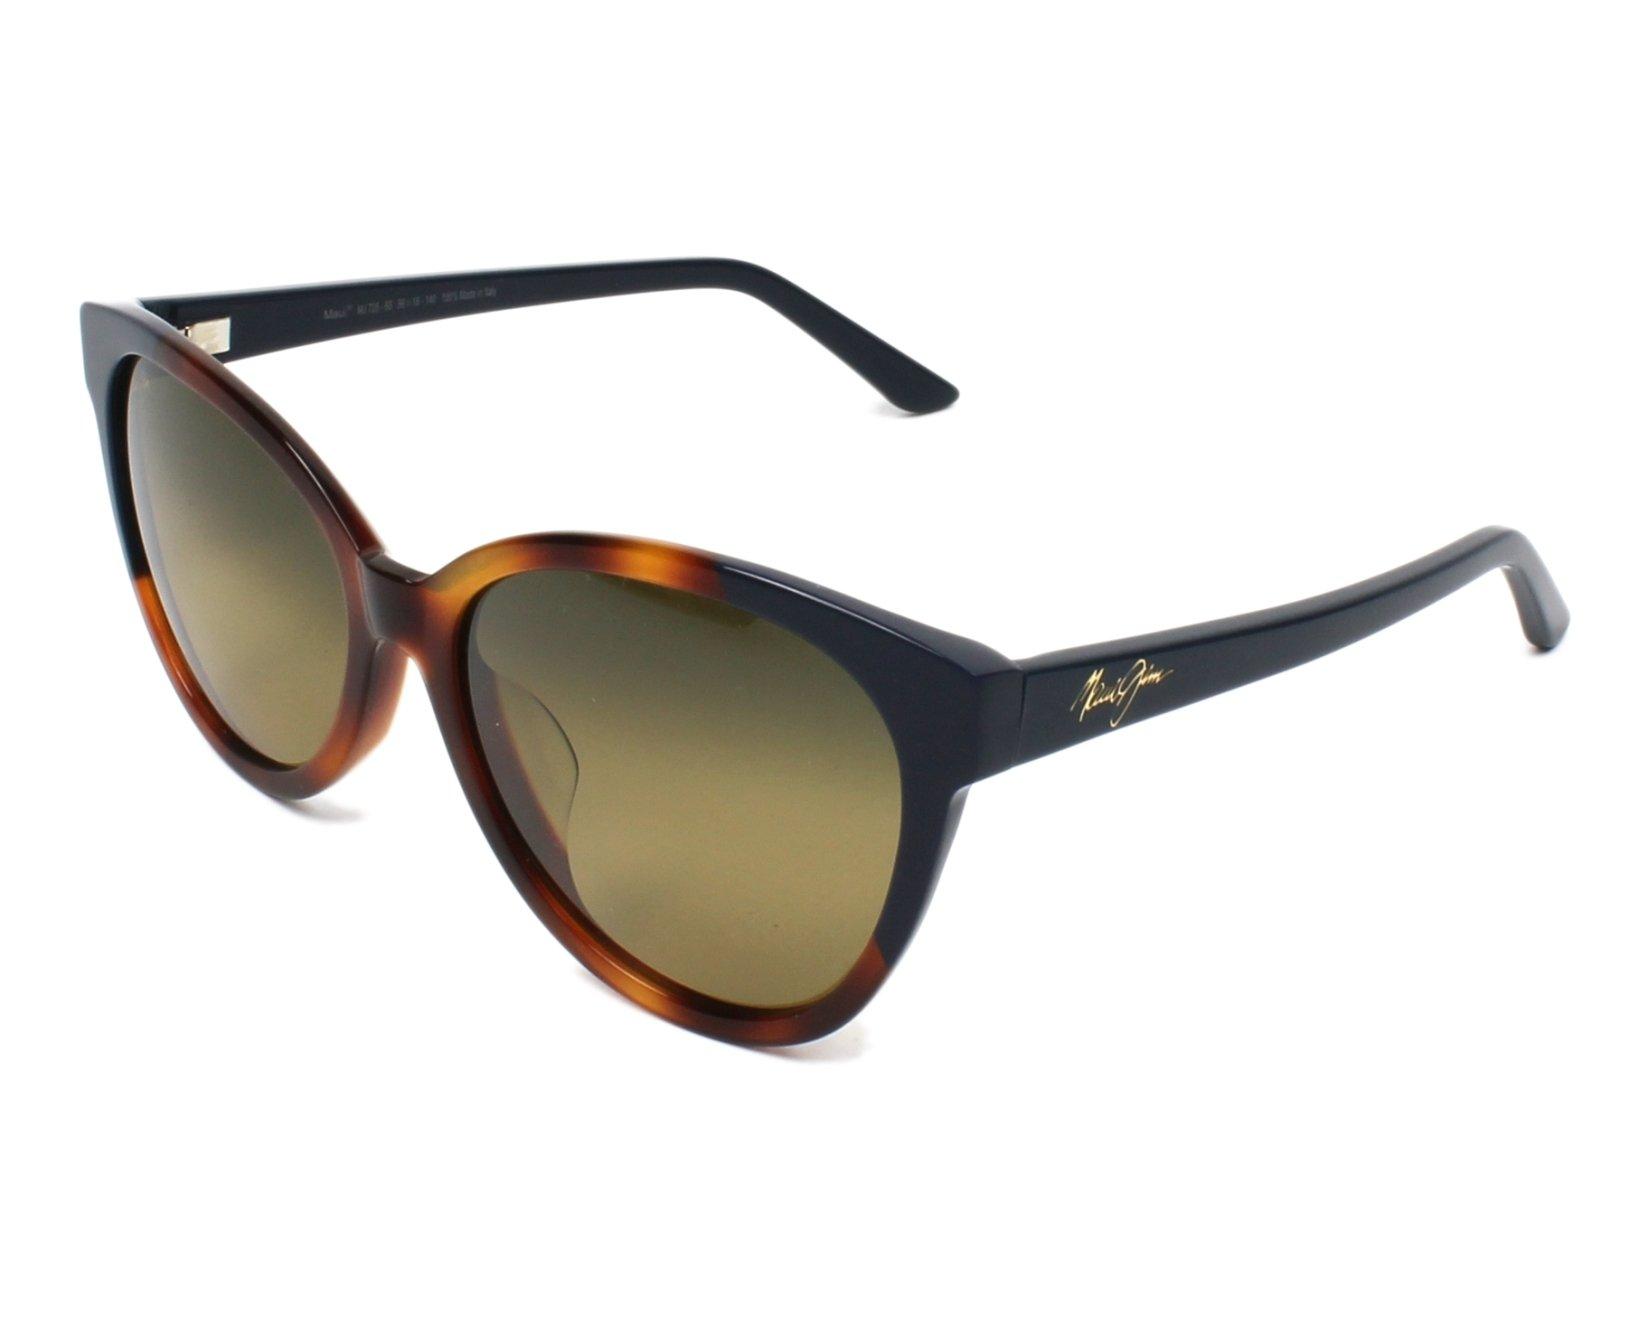 3a68b3d731bdc Polarized. Sunglasses Maui Jim HS-725 65 - Havana Blue profile view